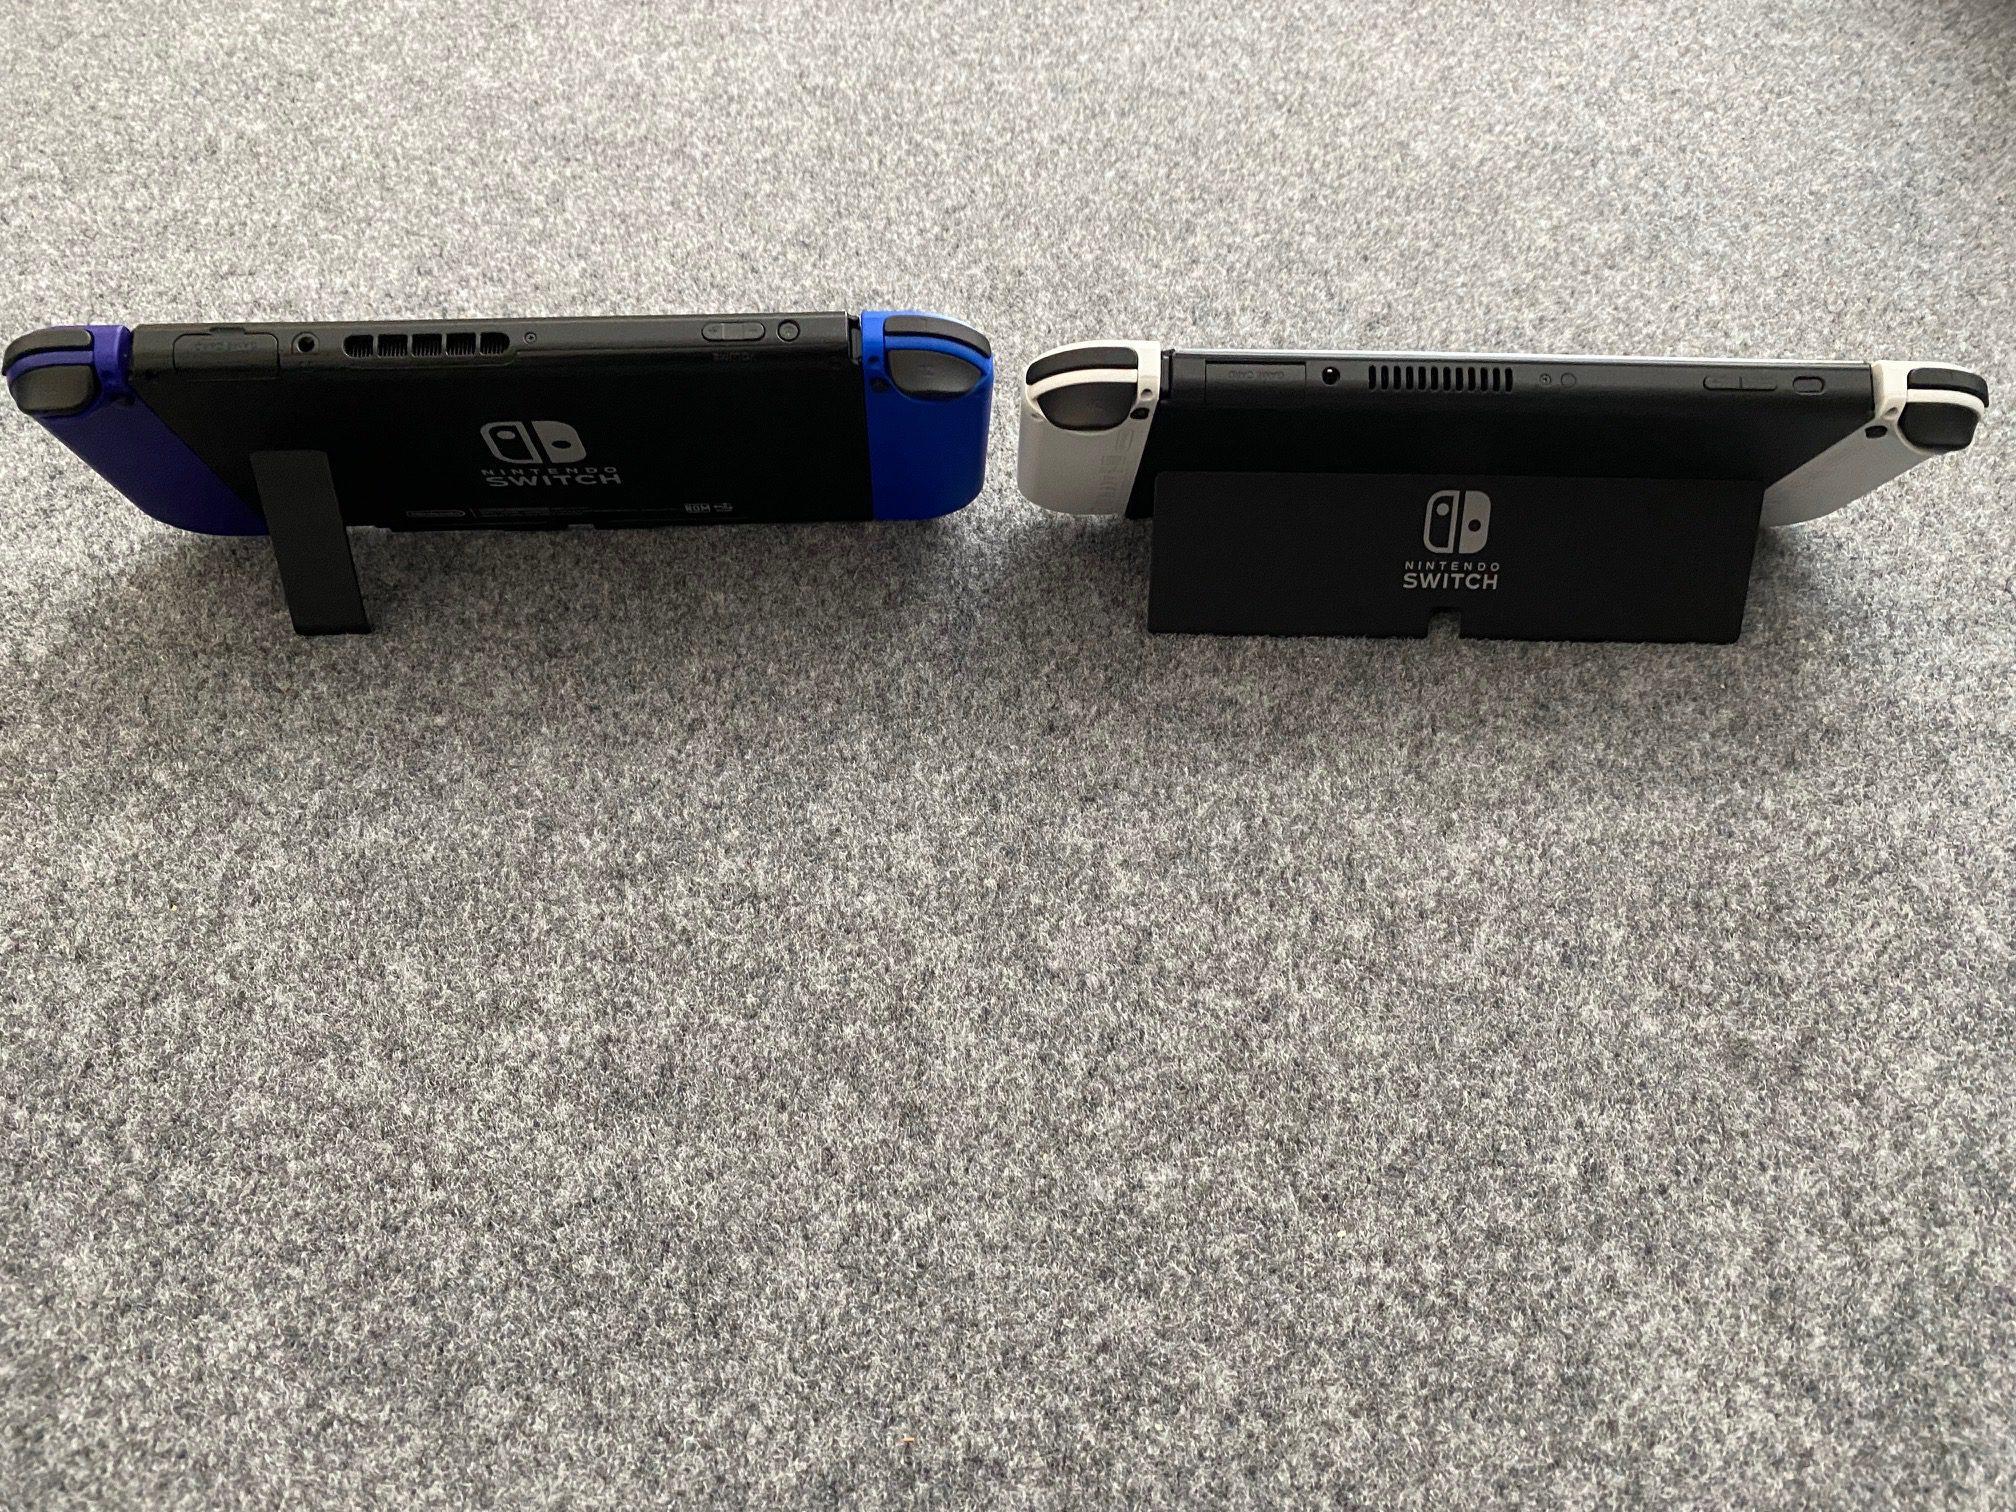 New Switch kickstand comparison